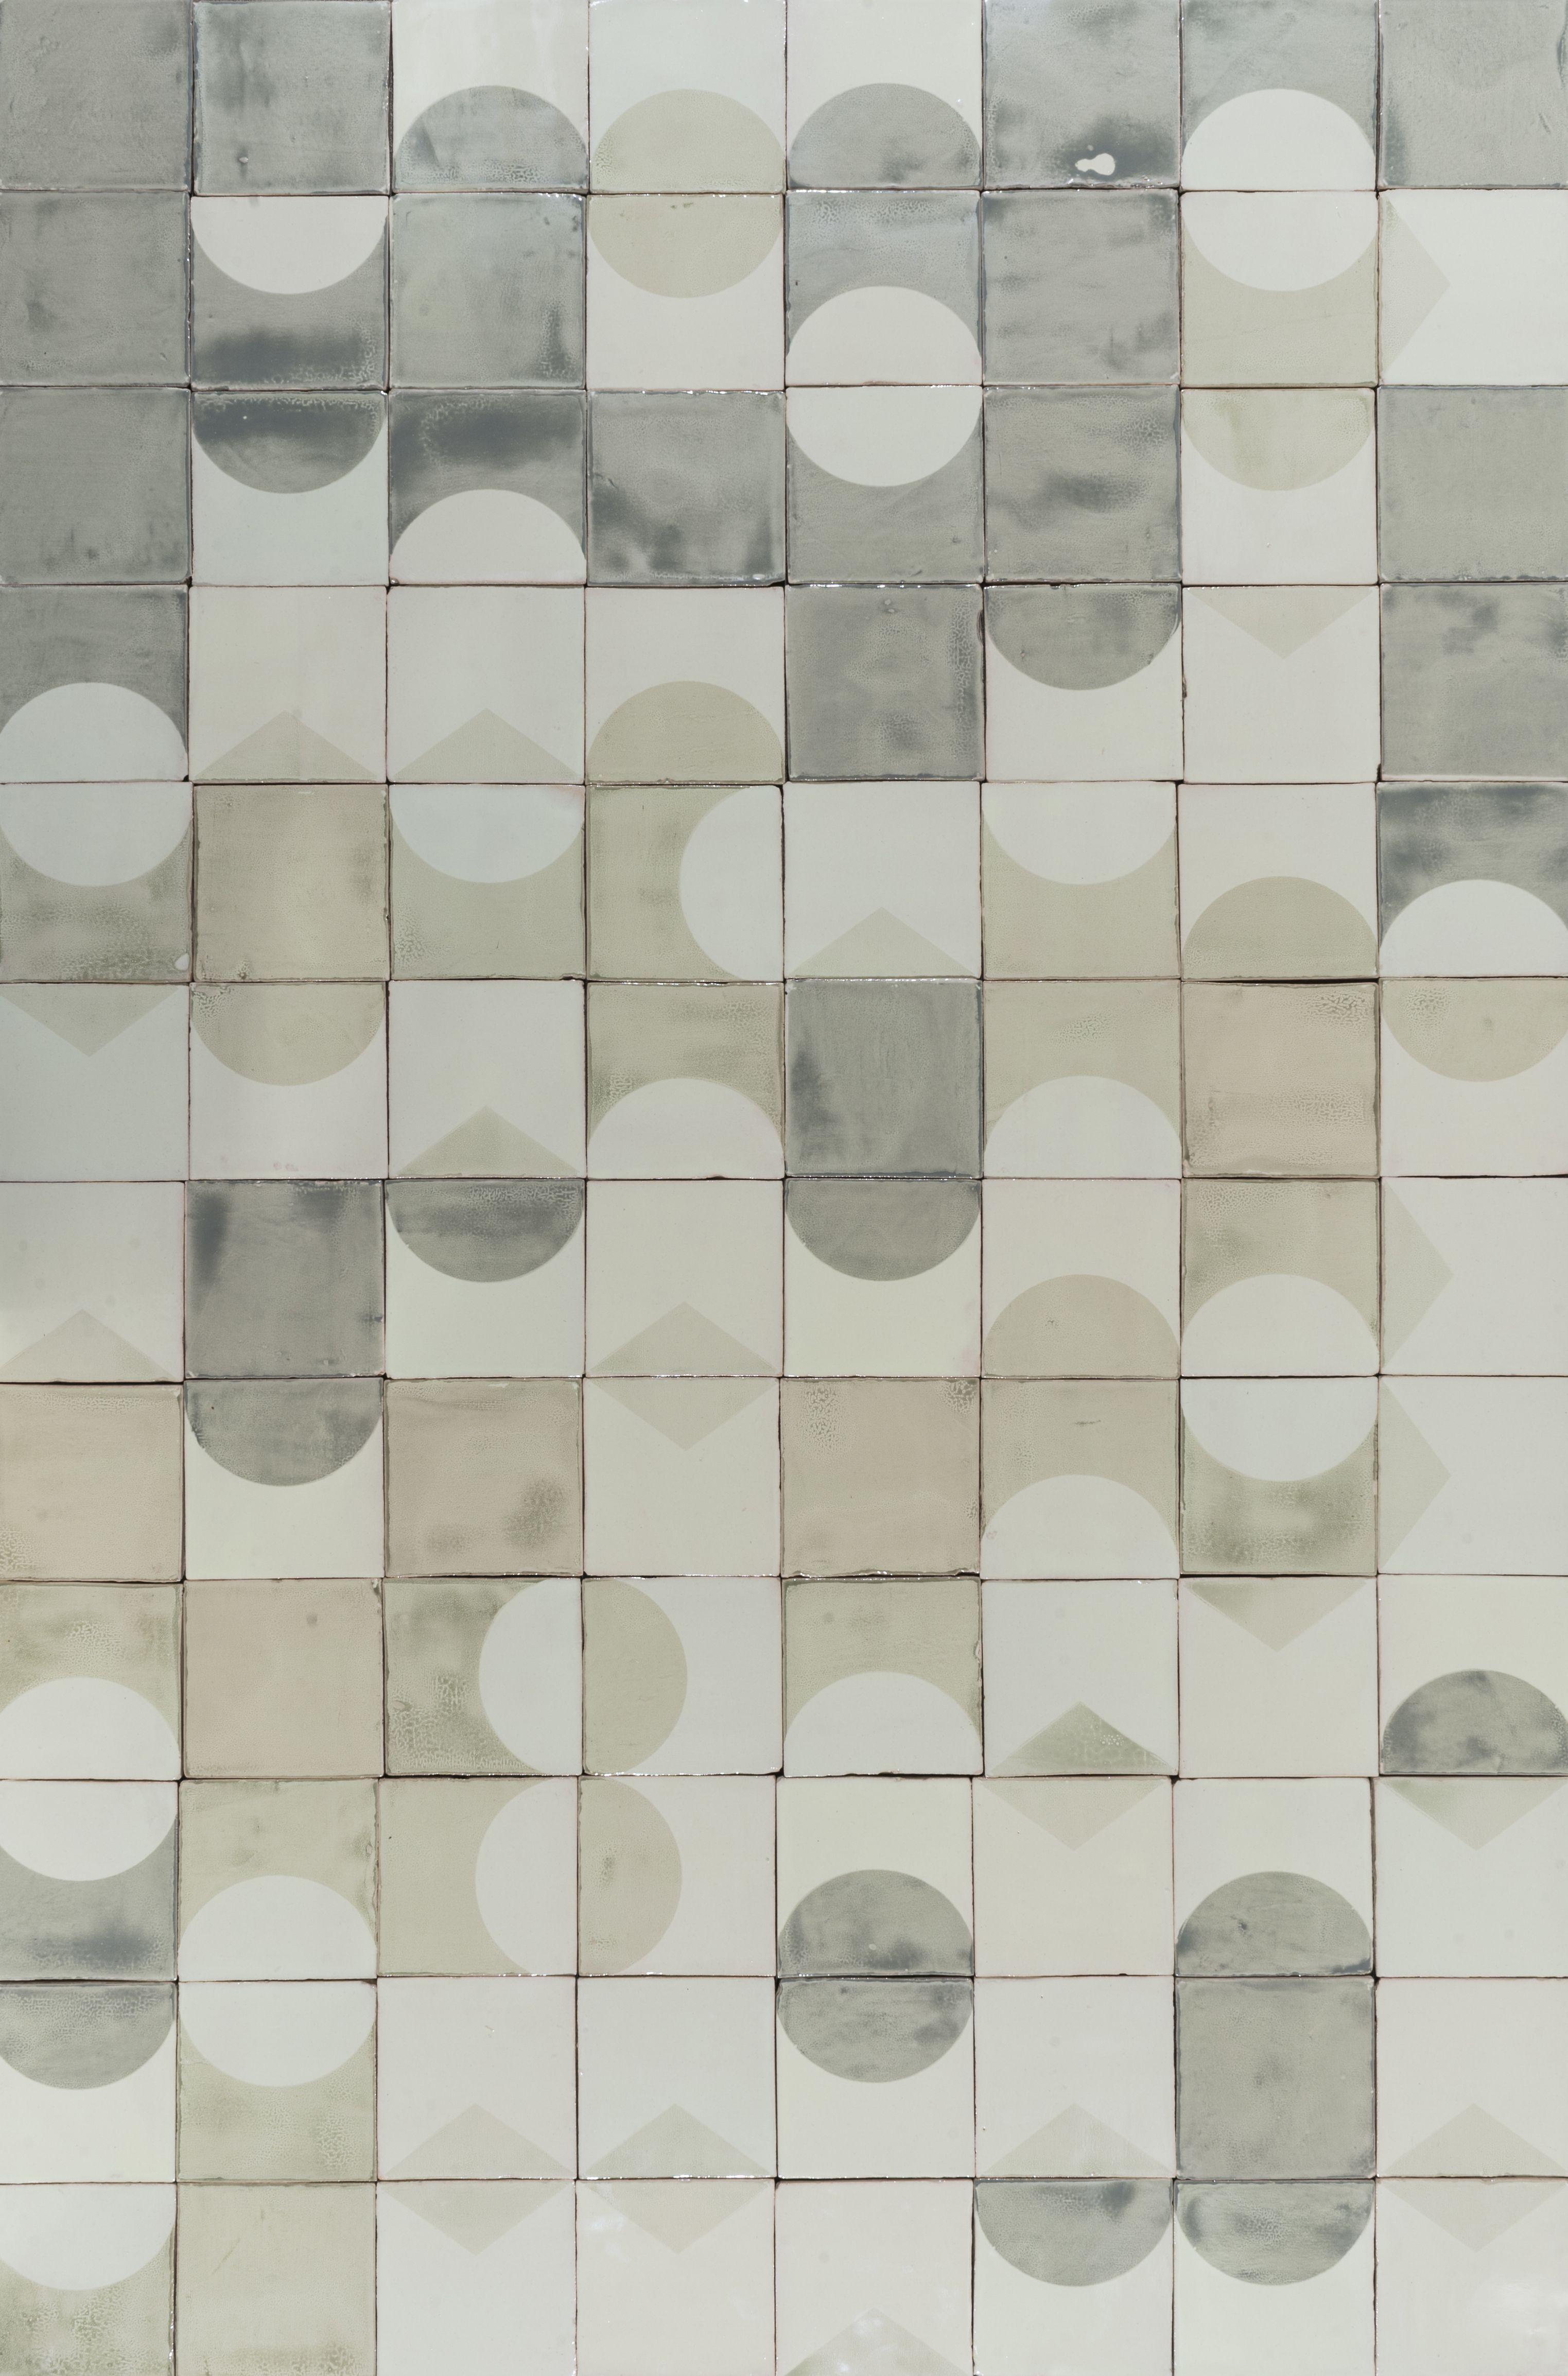 Pattern Of Handmade Printed Ceramic Tile Design Eclipse Ceramic Floor Tiles Ceramic Floor Tile Patterned Floor Tiles